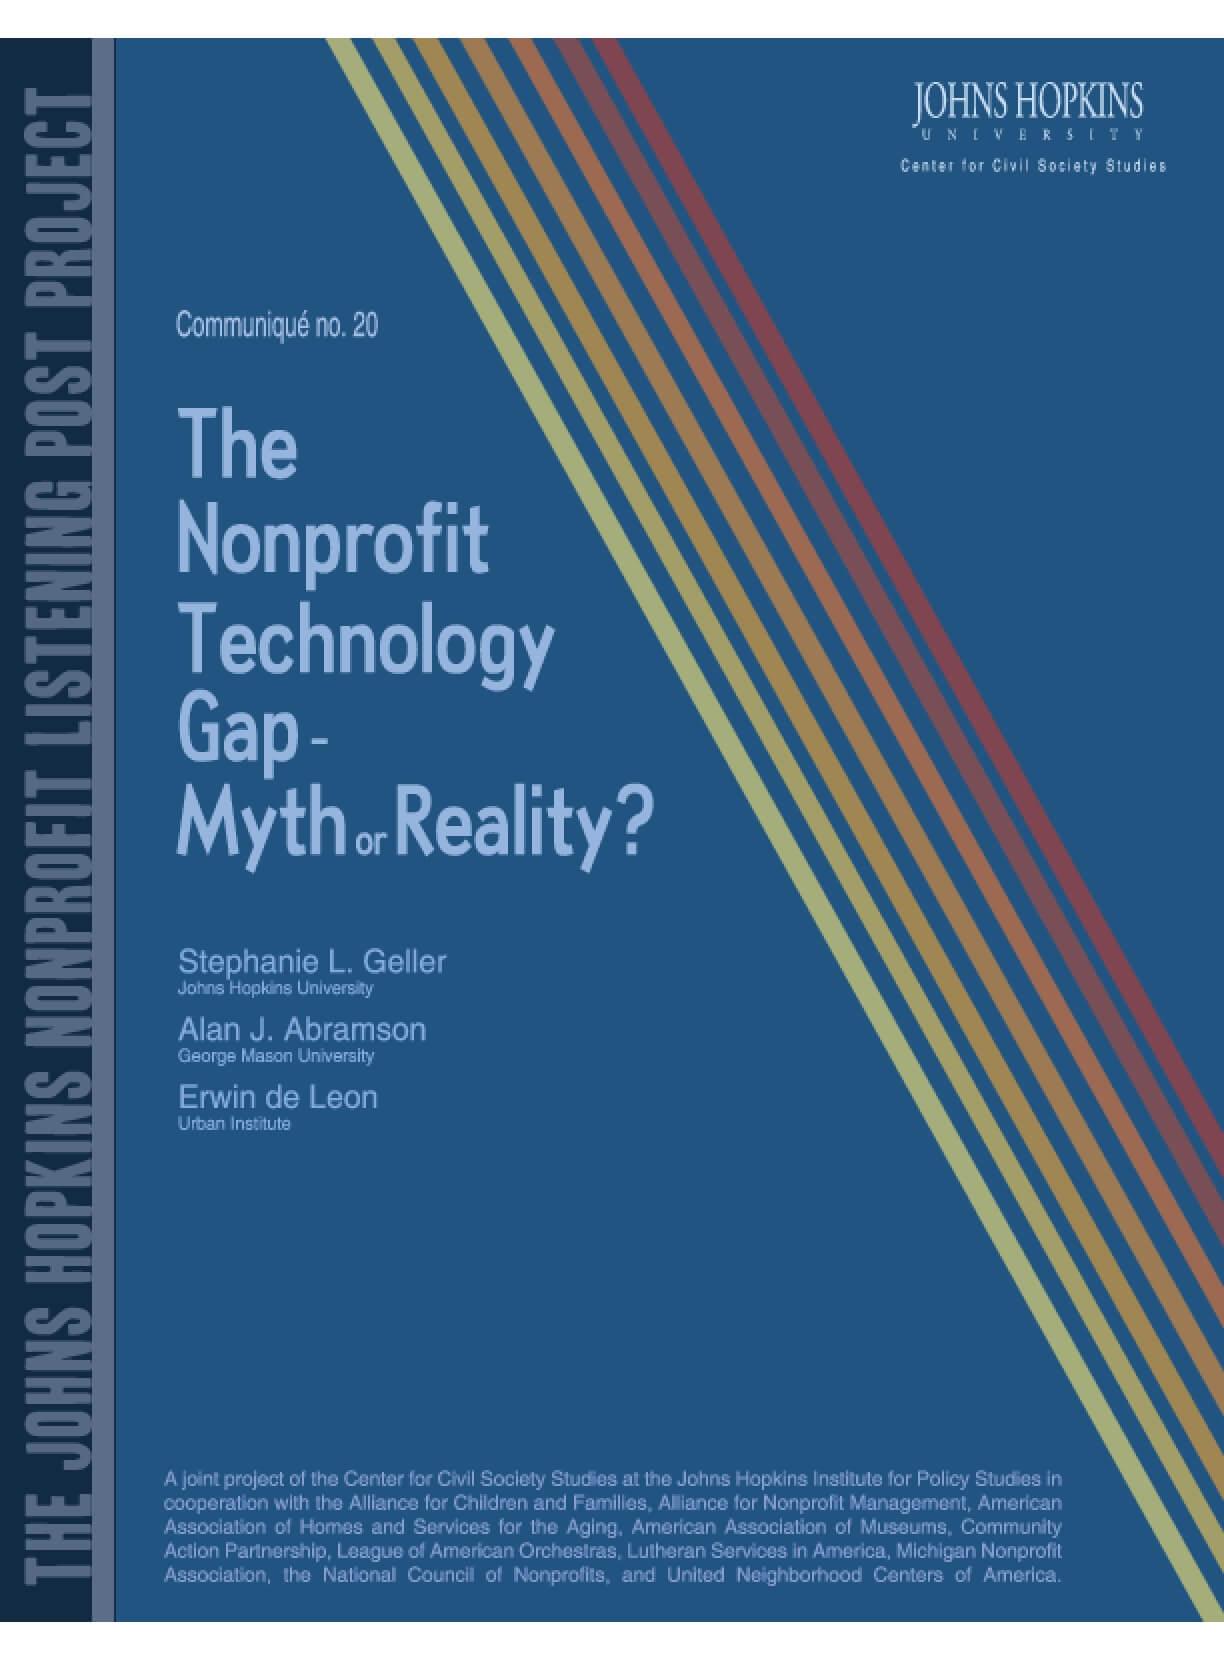 The Nonprofit Technology Gap - Myth or Reality?